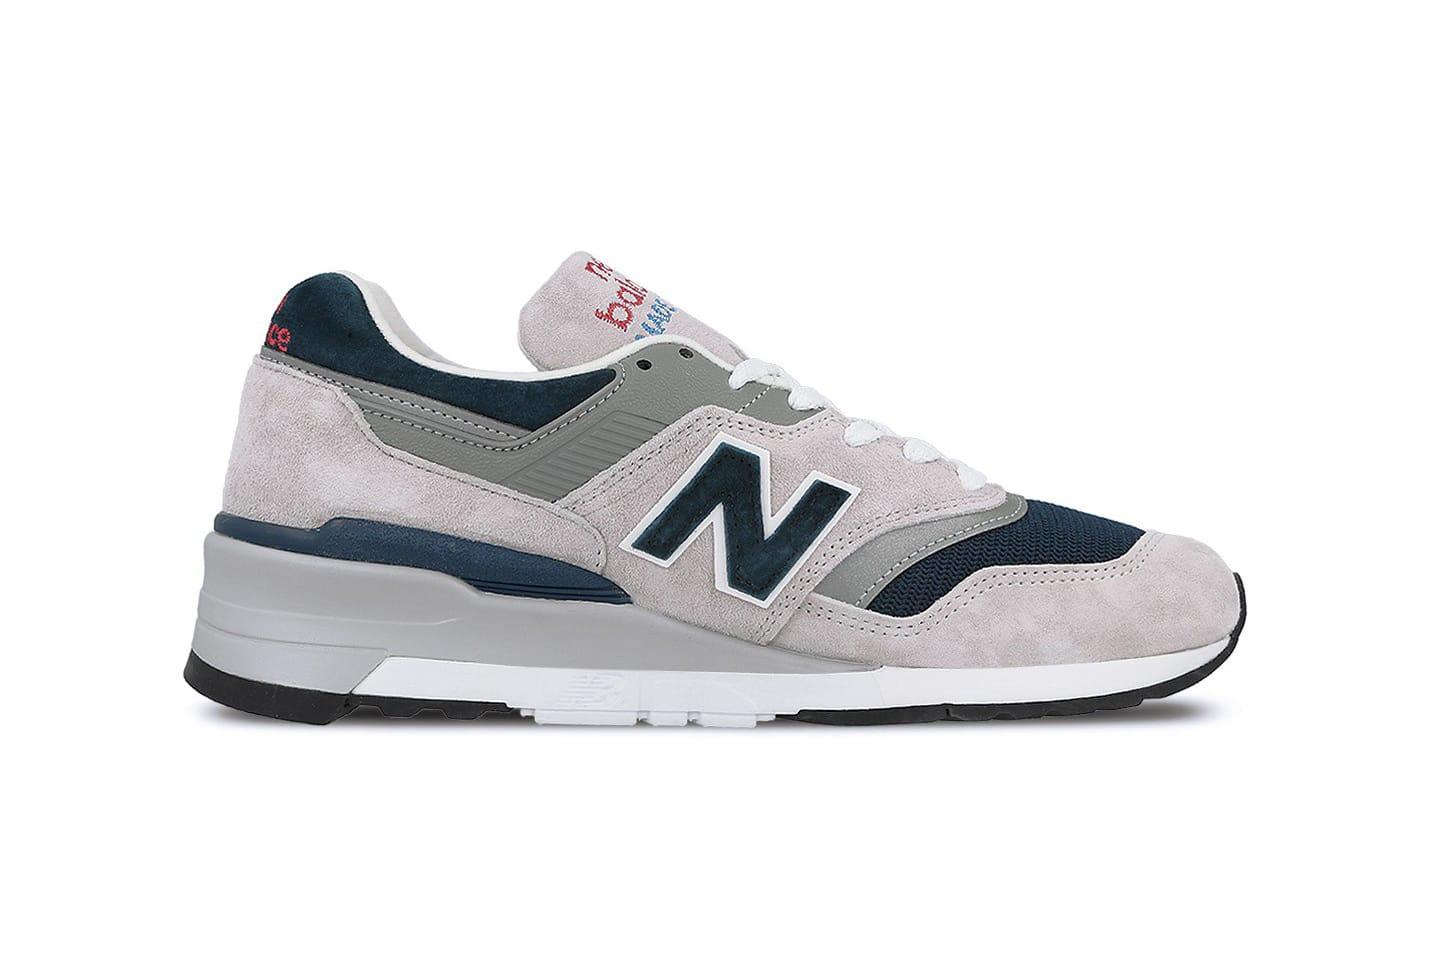 new balance 997 grey white